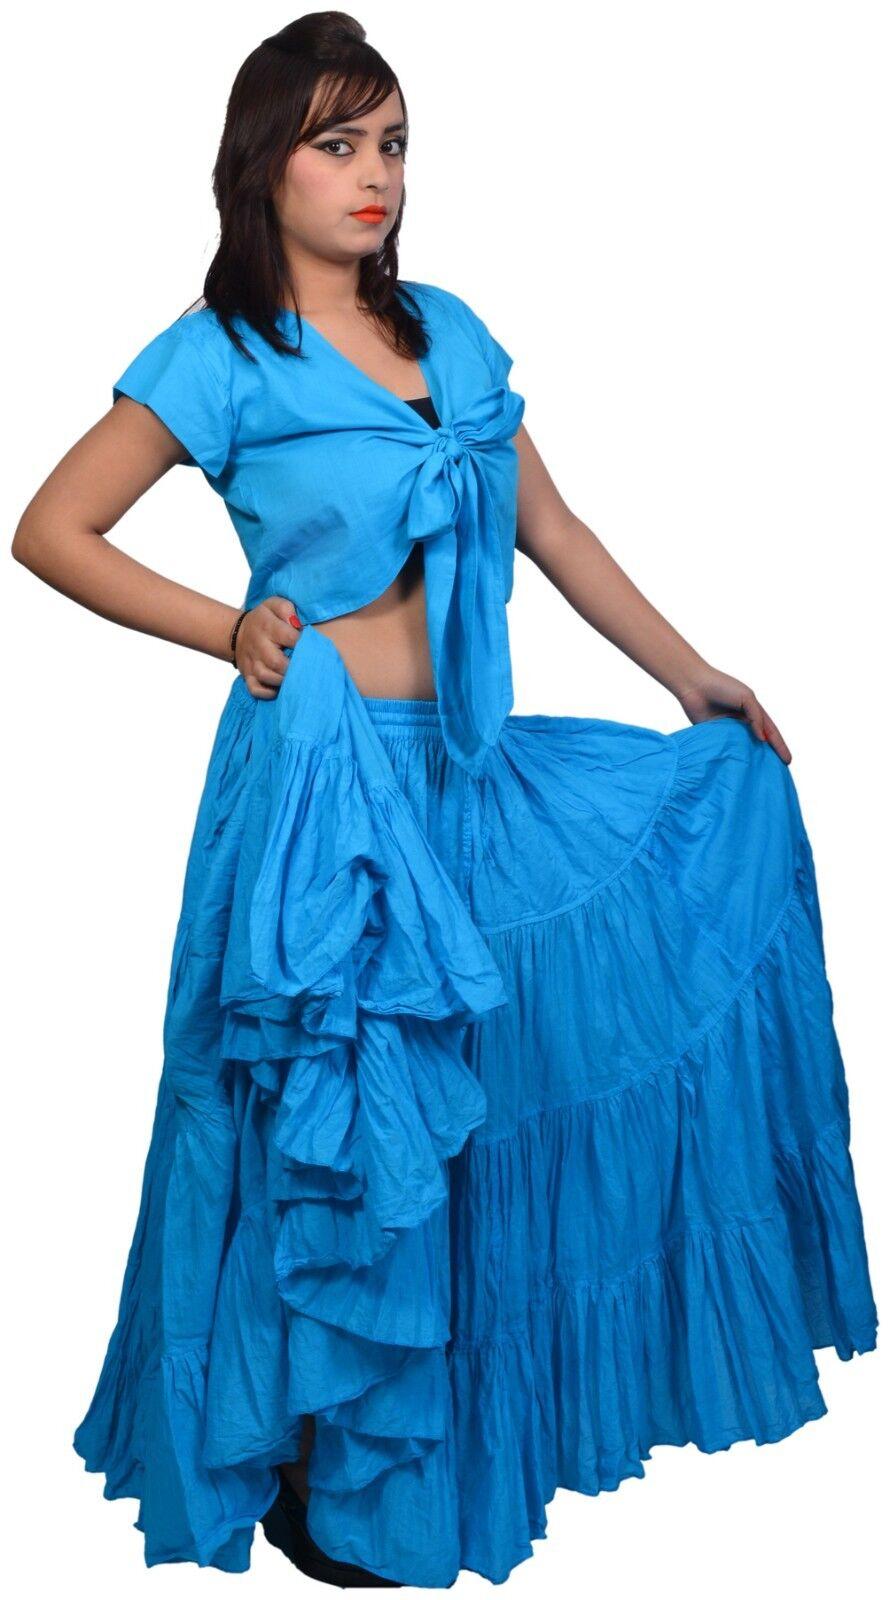 Wevez 25 Yard ATS Dance Skirts - Belly Dance Skirts